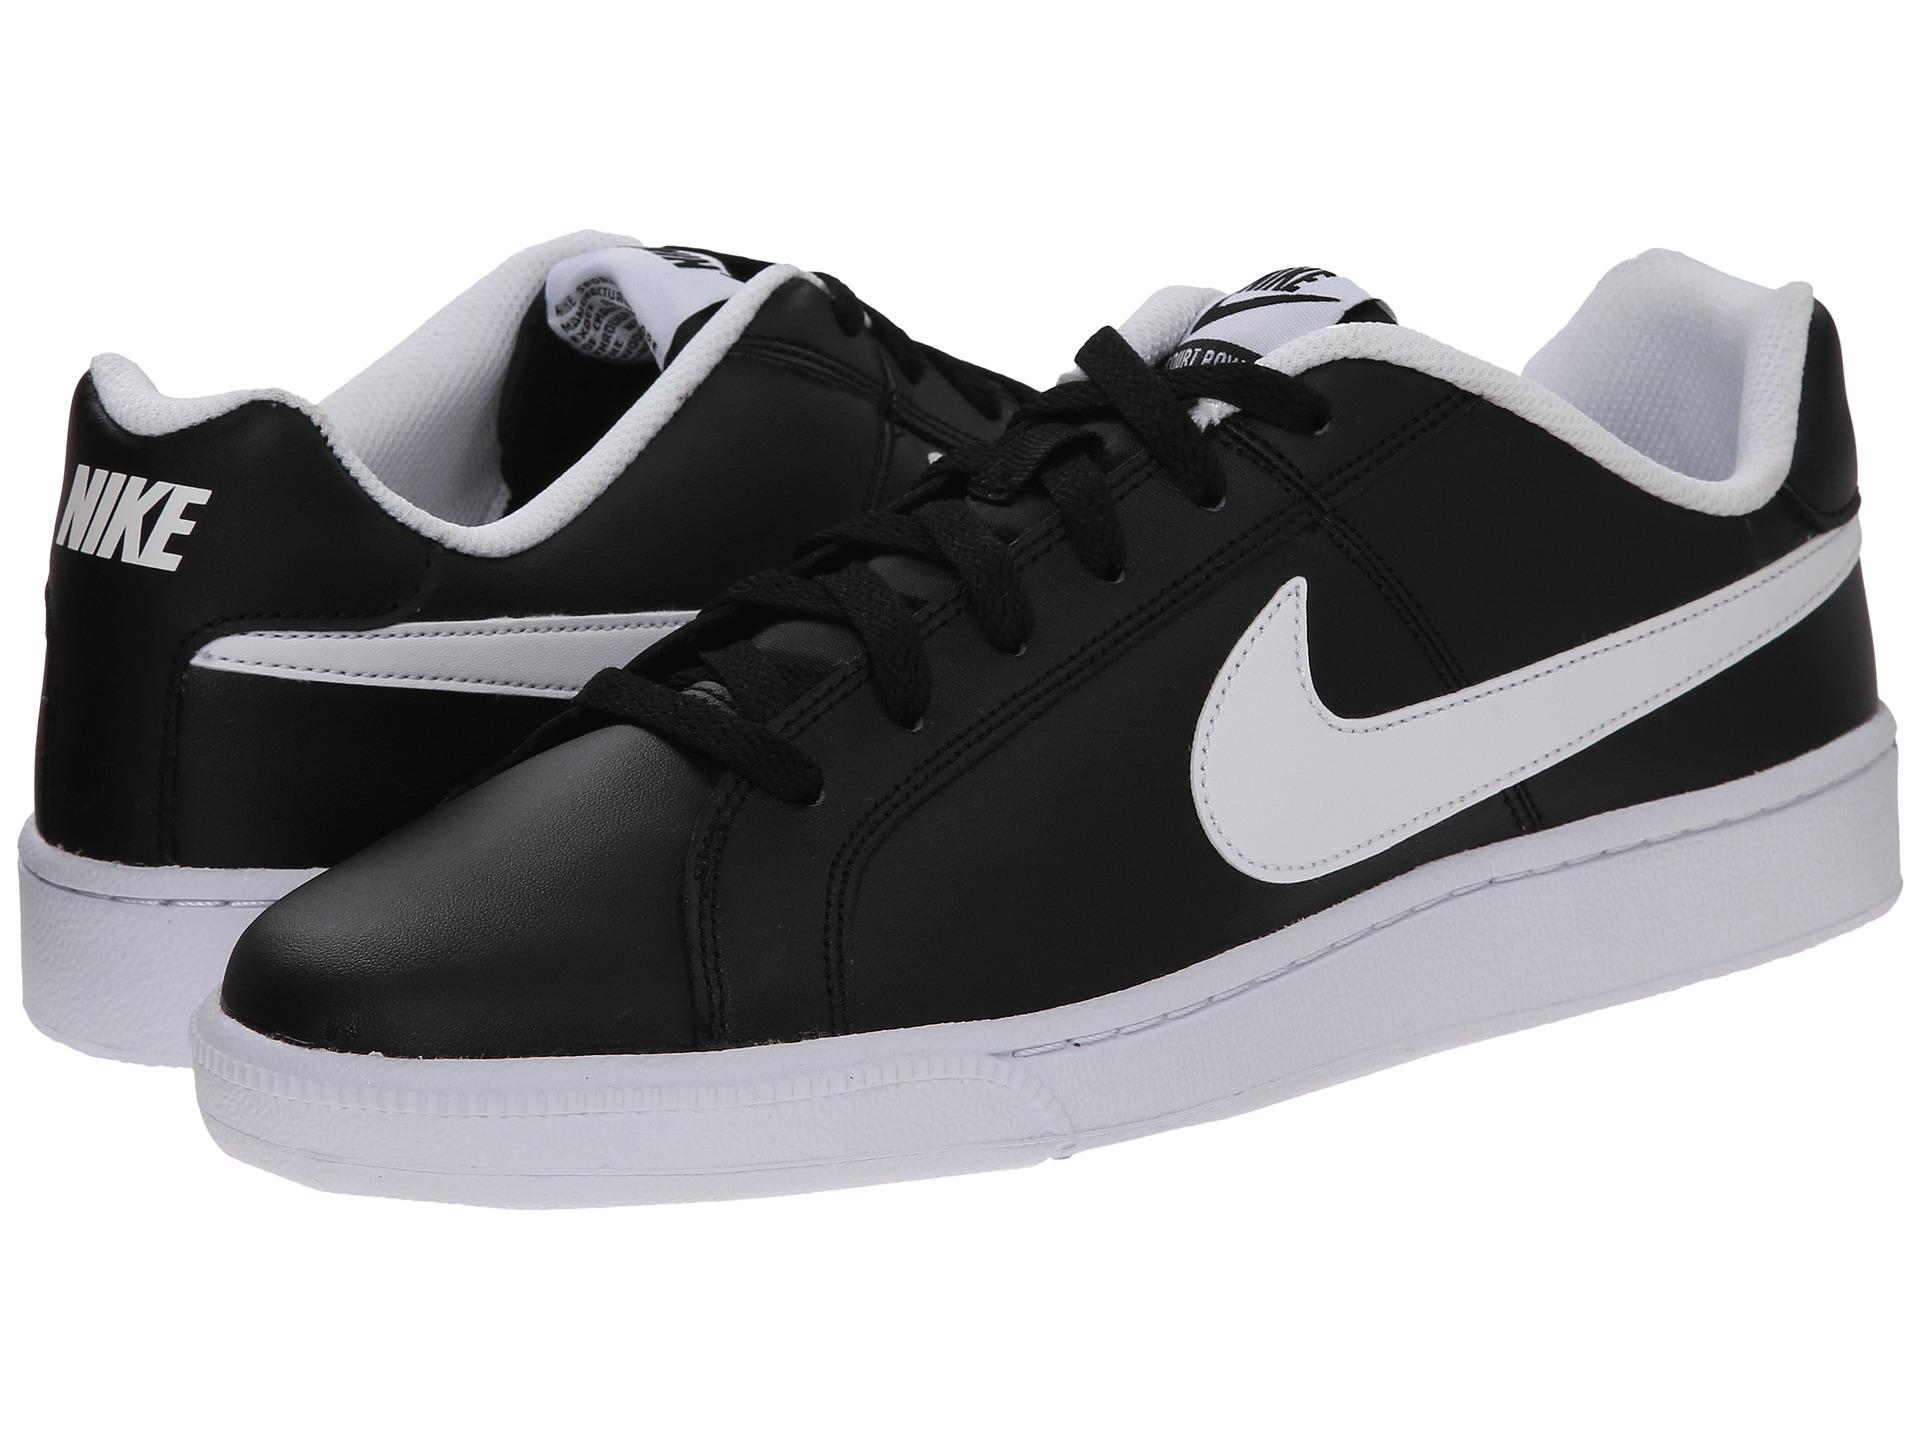 Nike Court Royale - Zappos.com Free Shipping BOTH Ways